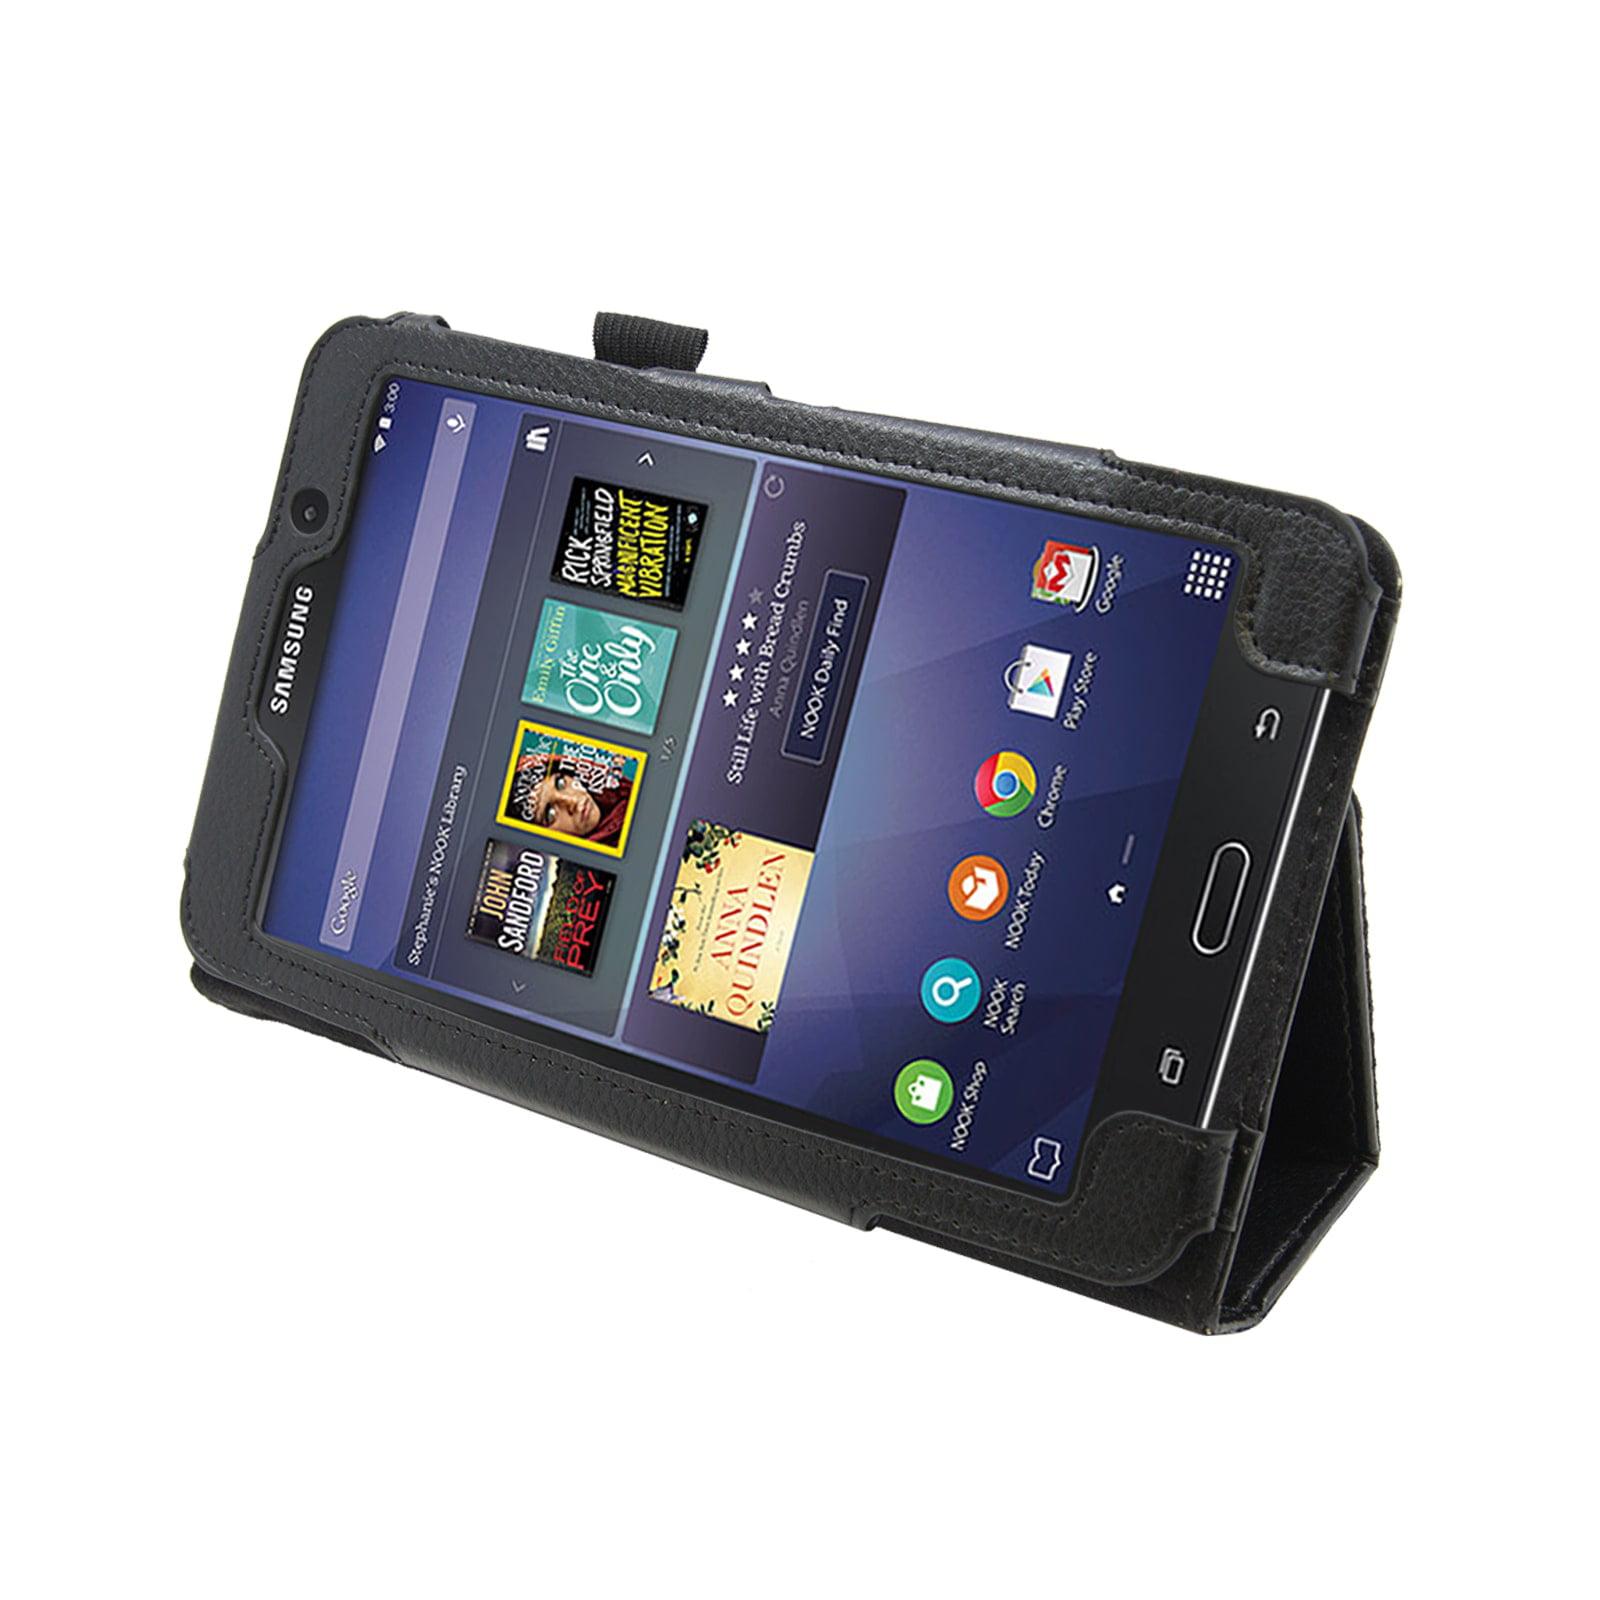 MGear Galaxy Tab 4 7.0 T230 PU Leather Case